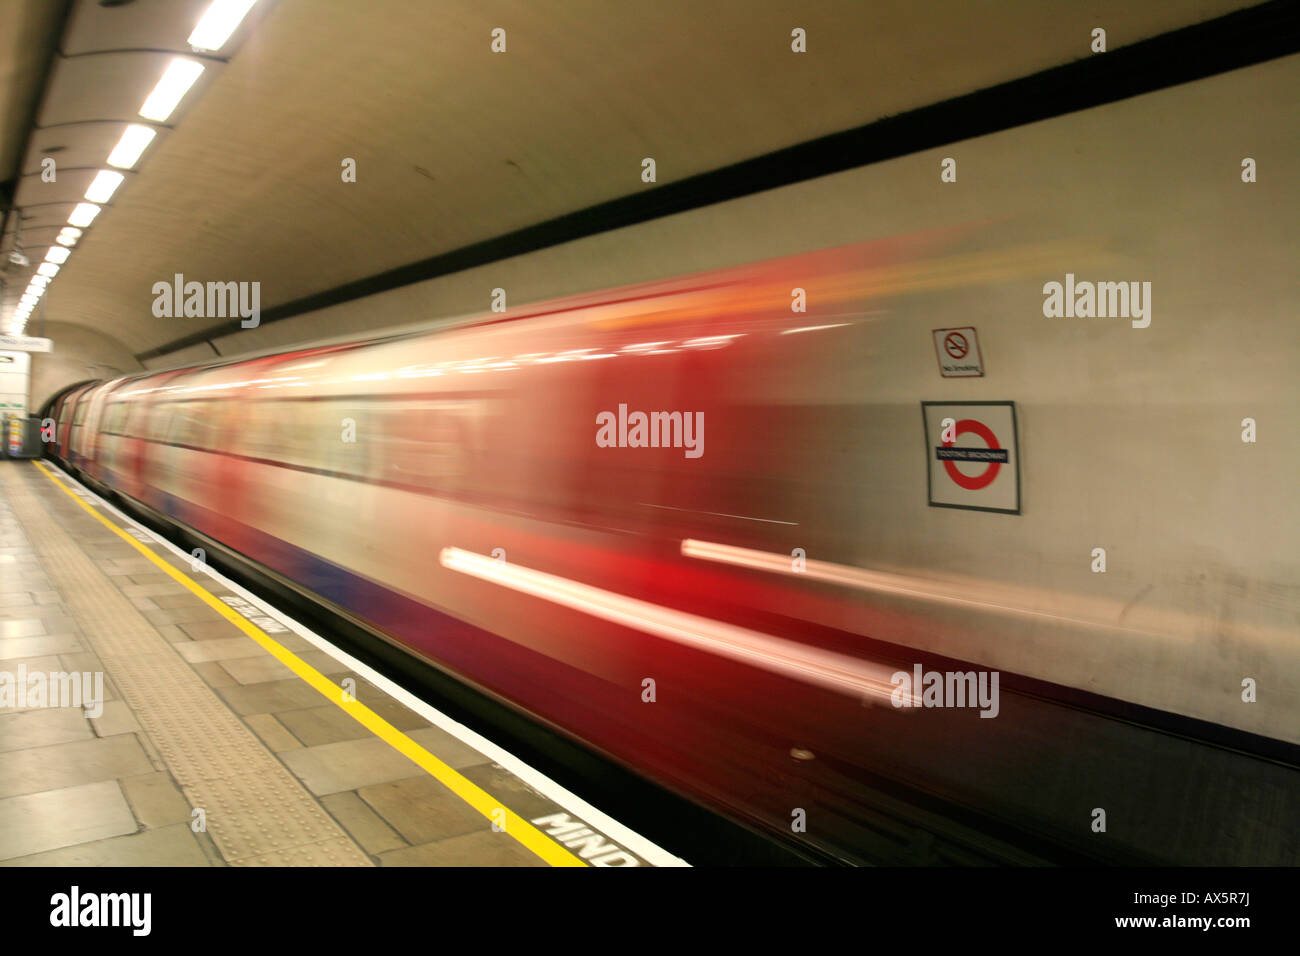 Train arriving at Tooting Broadway underground station, London, England, UK, Europe - Stock Image